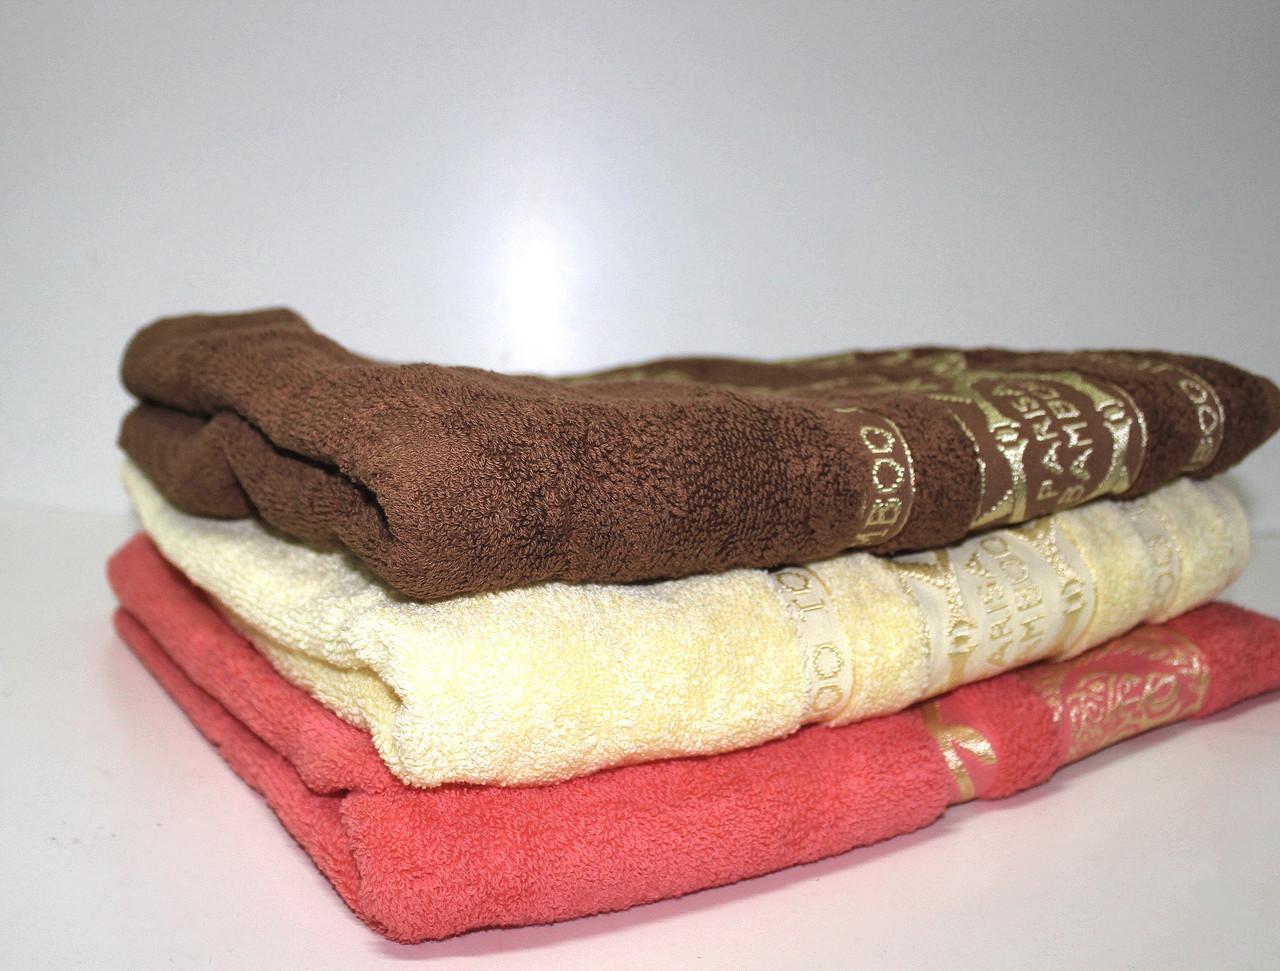 Полотенце Лицо Узбекистан (уп. 8 шт.) Хлопок